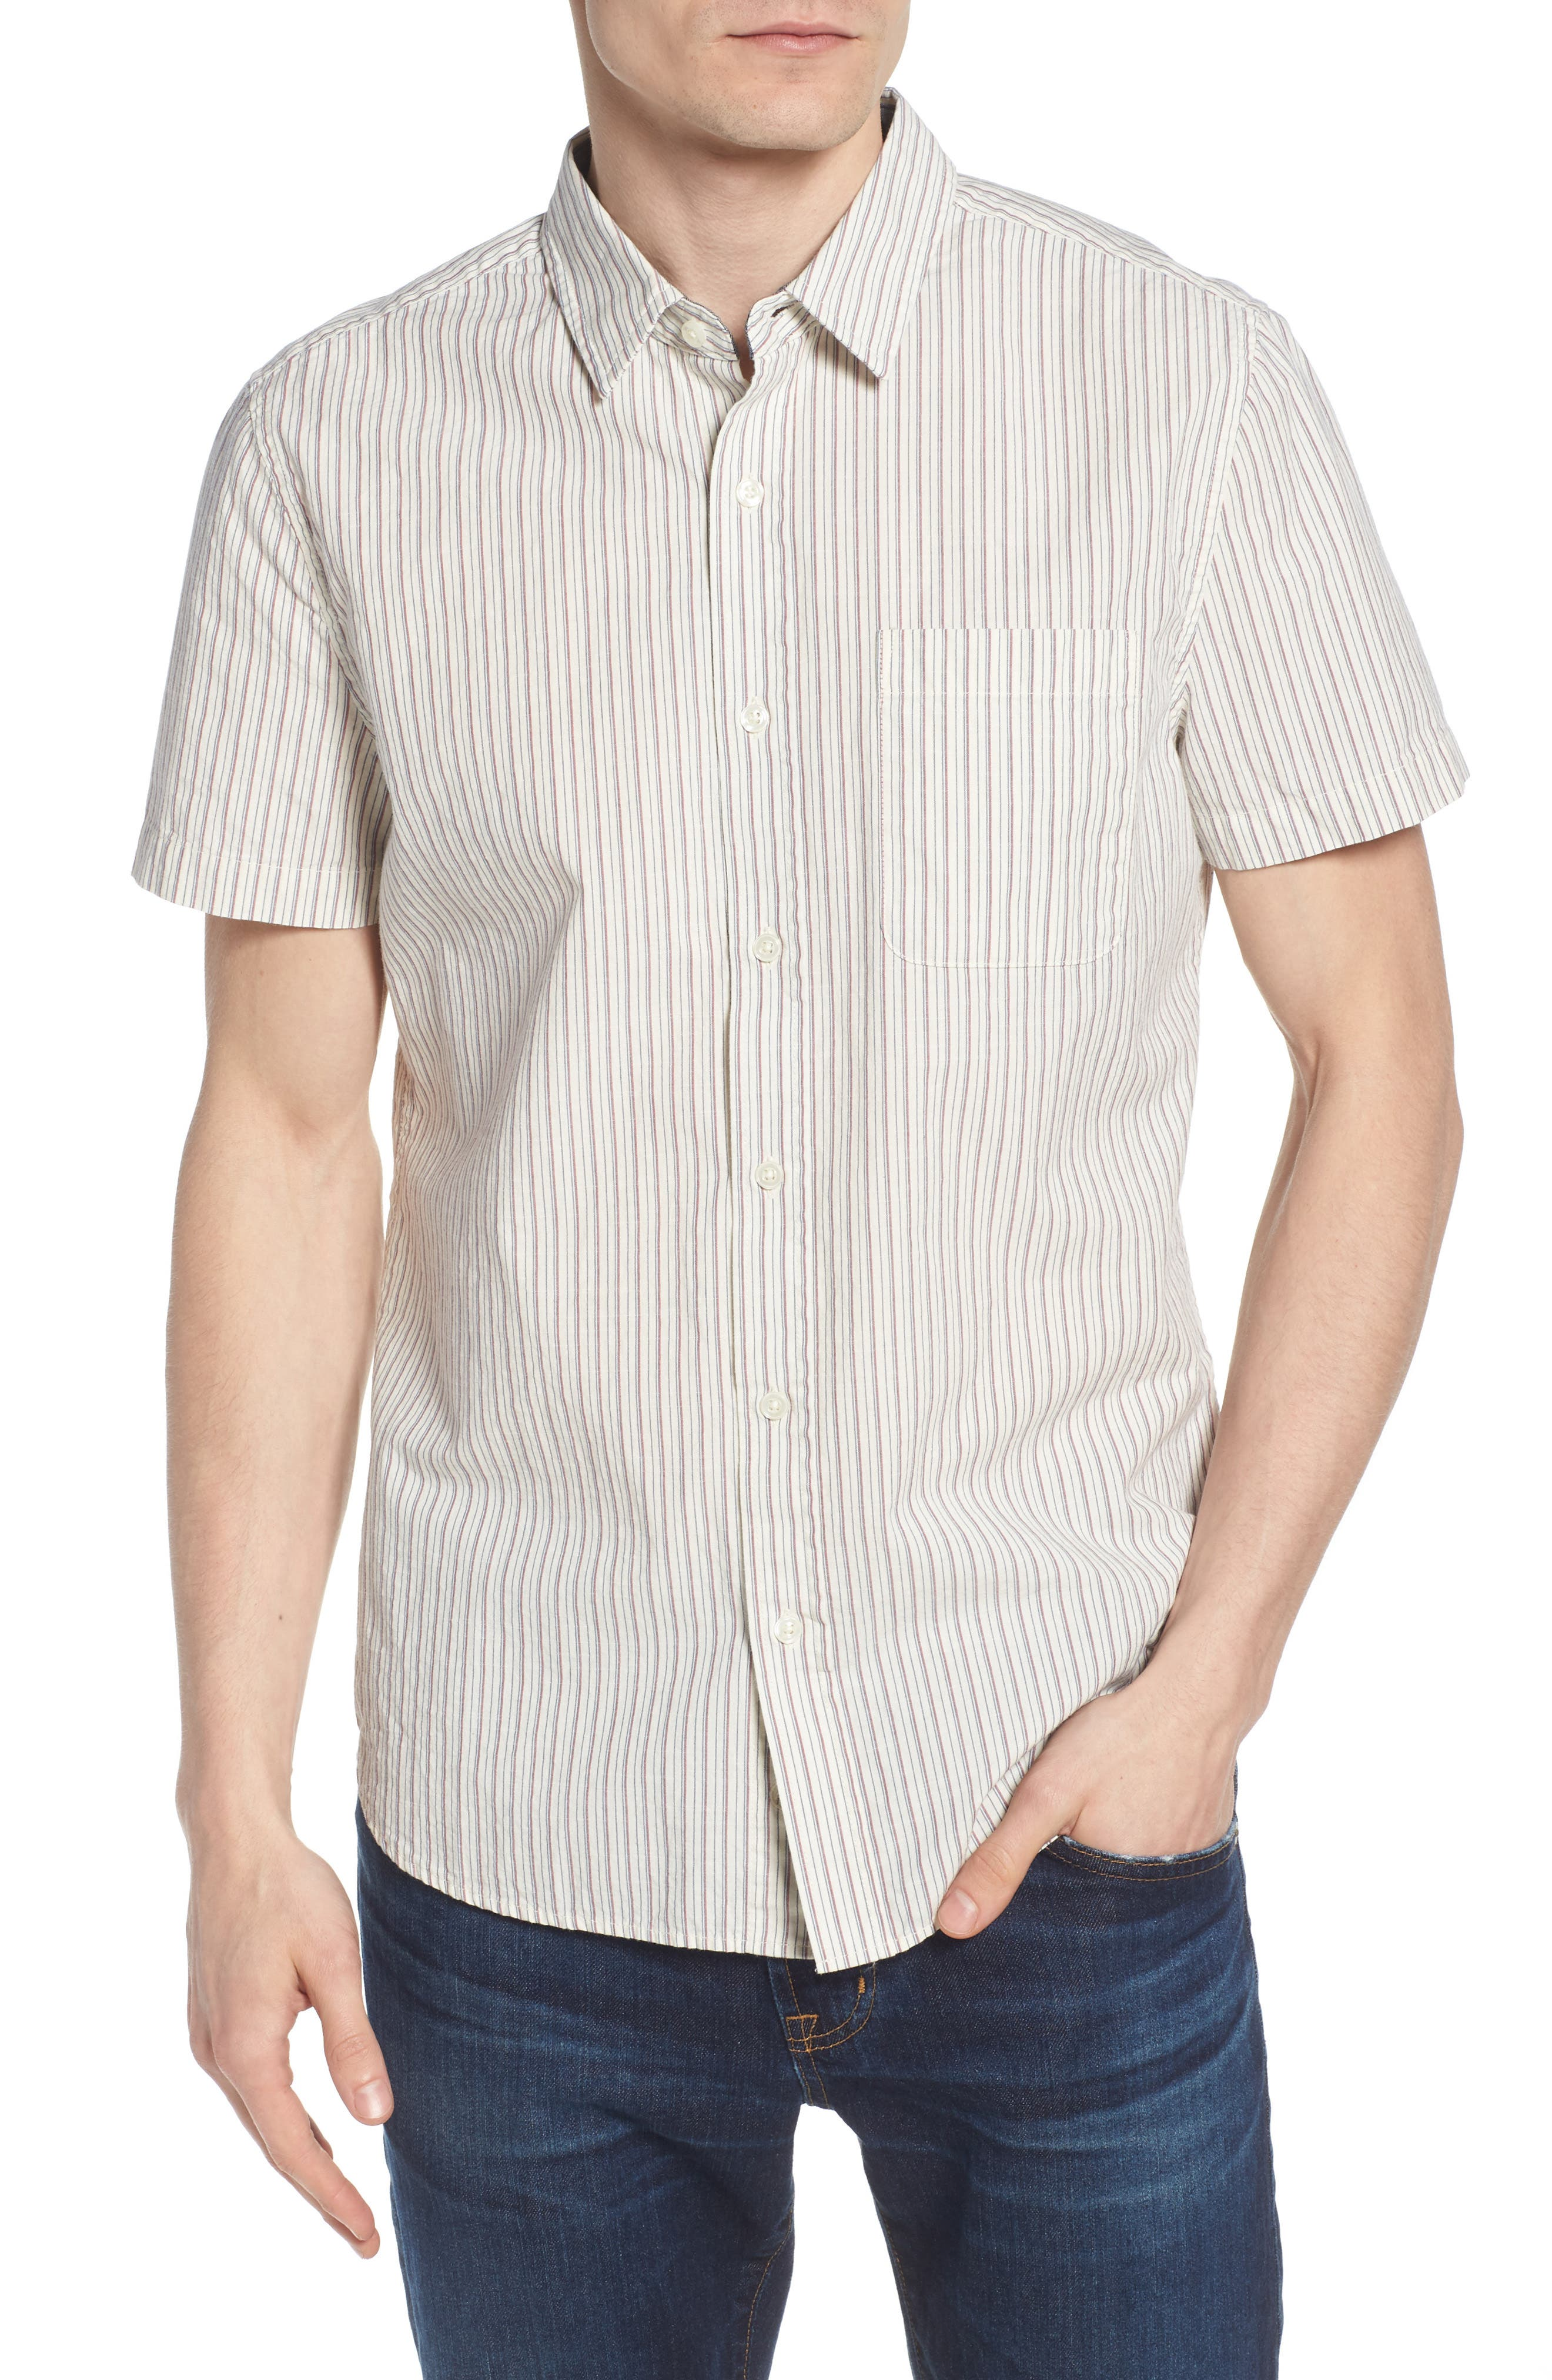 AG Nash Regular Fit Short Sleeve Sport Shirt